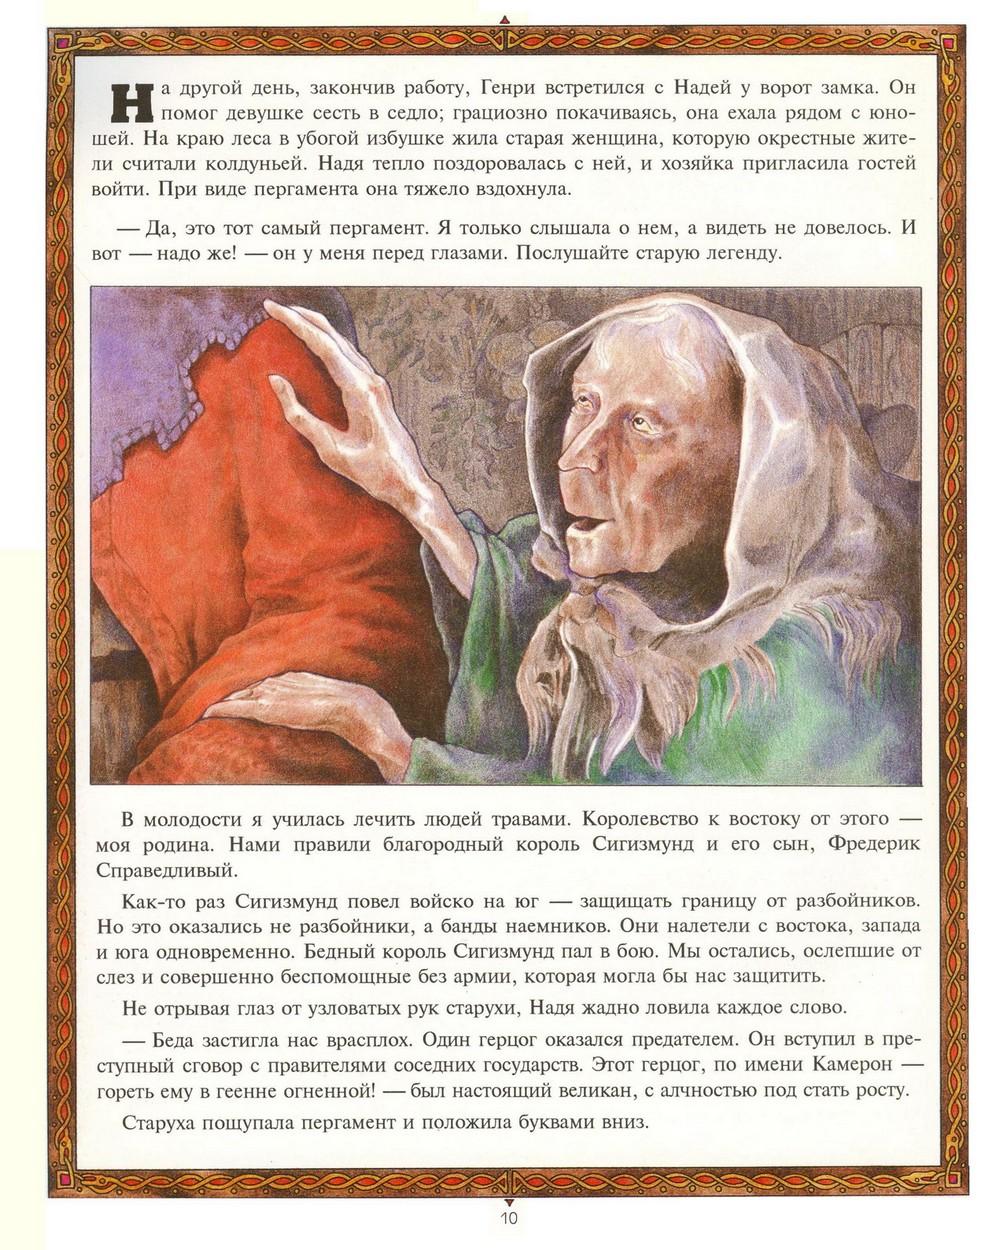 http://images.vfl.ru/ii/1362056492/ac8a0881/1850127.jpg